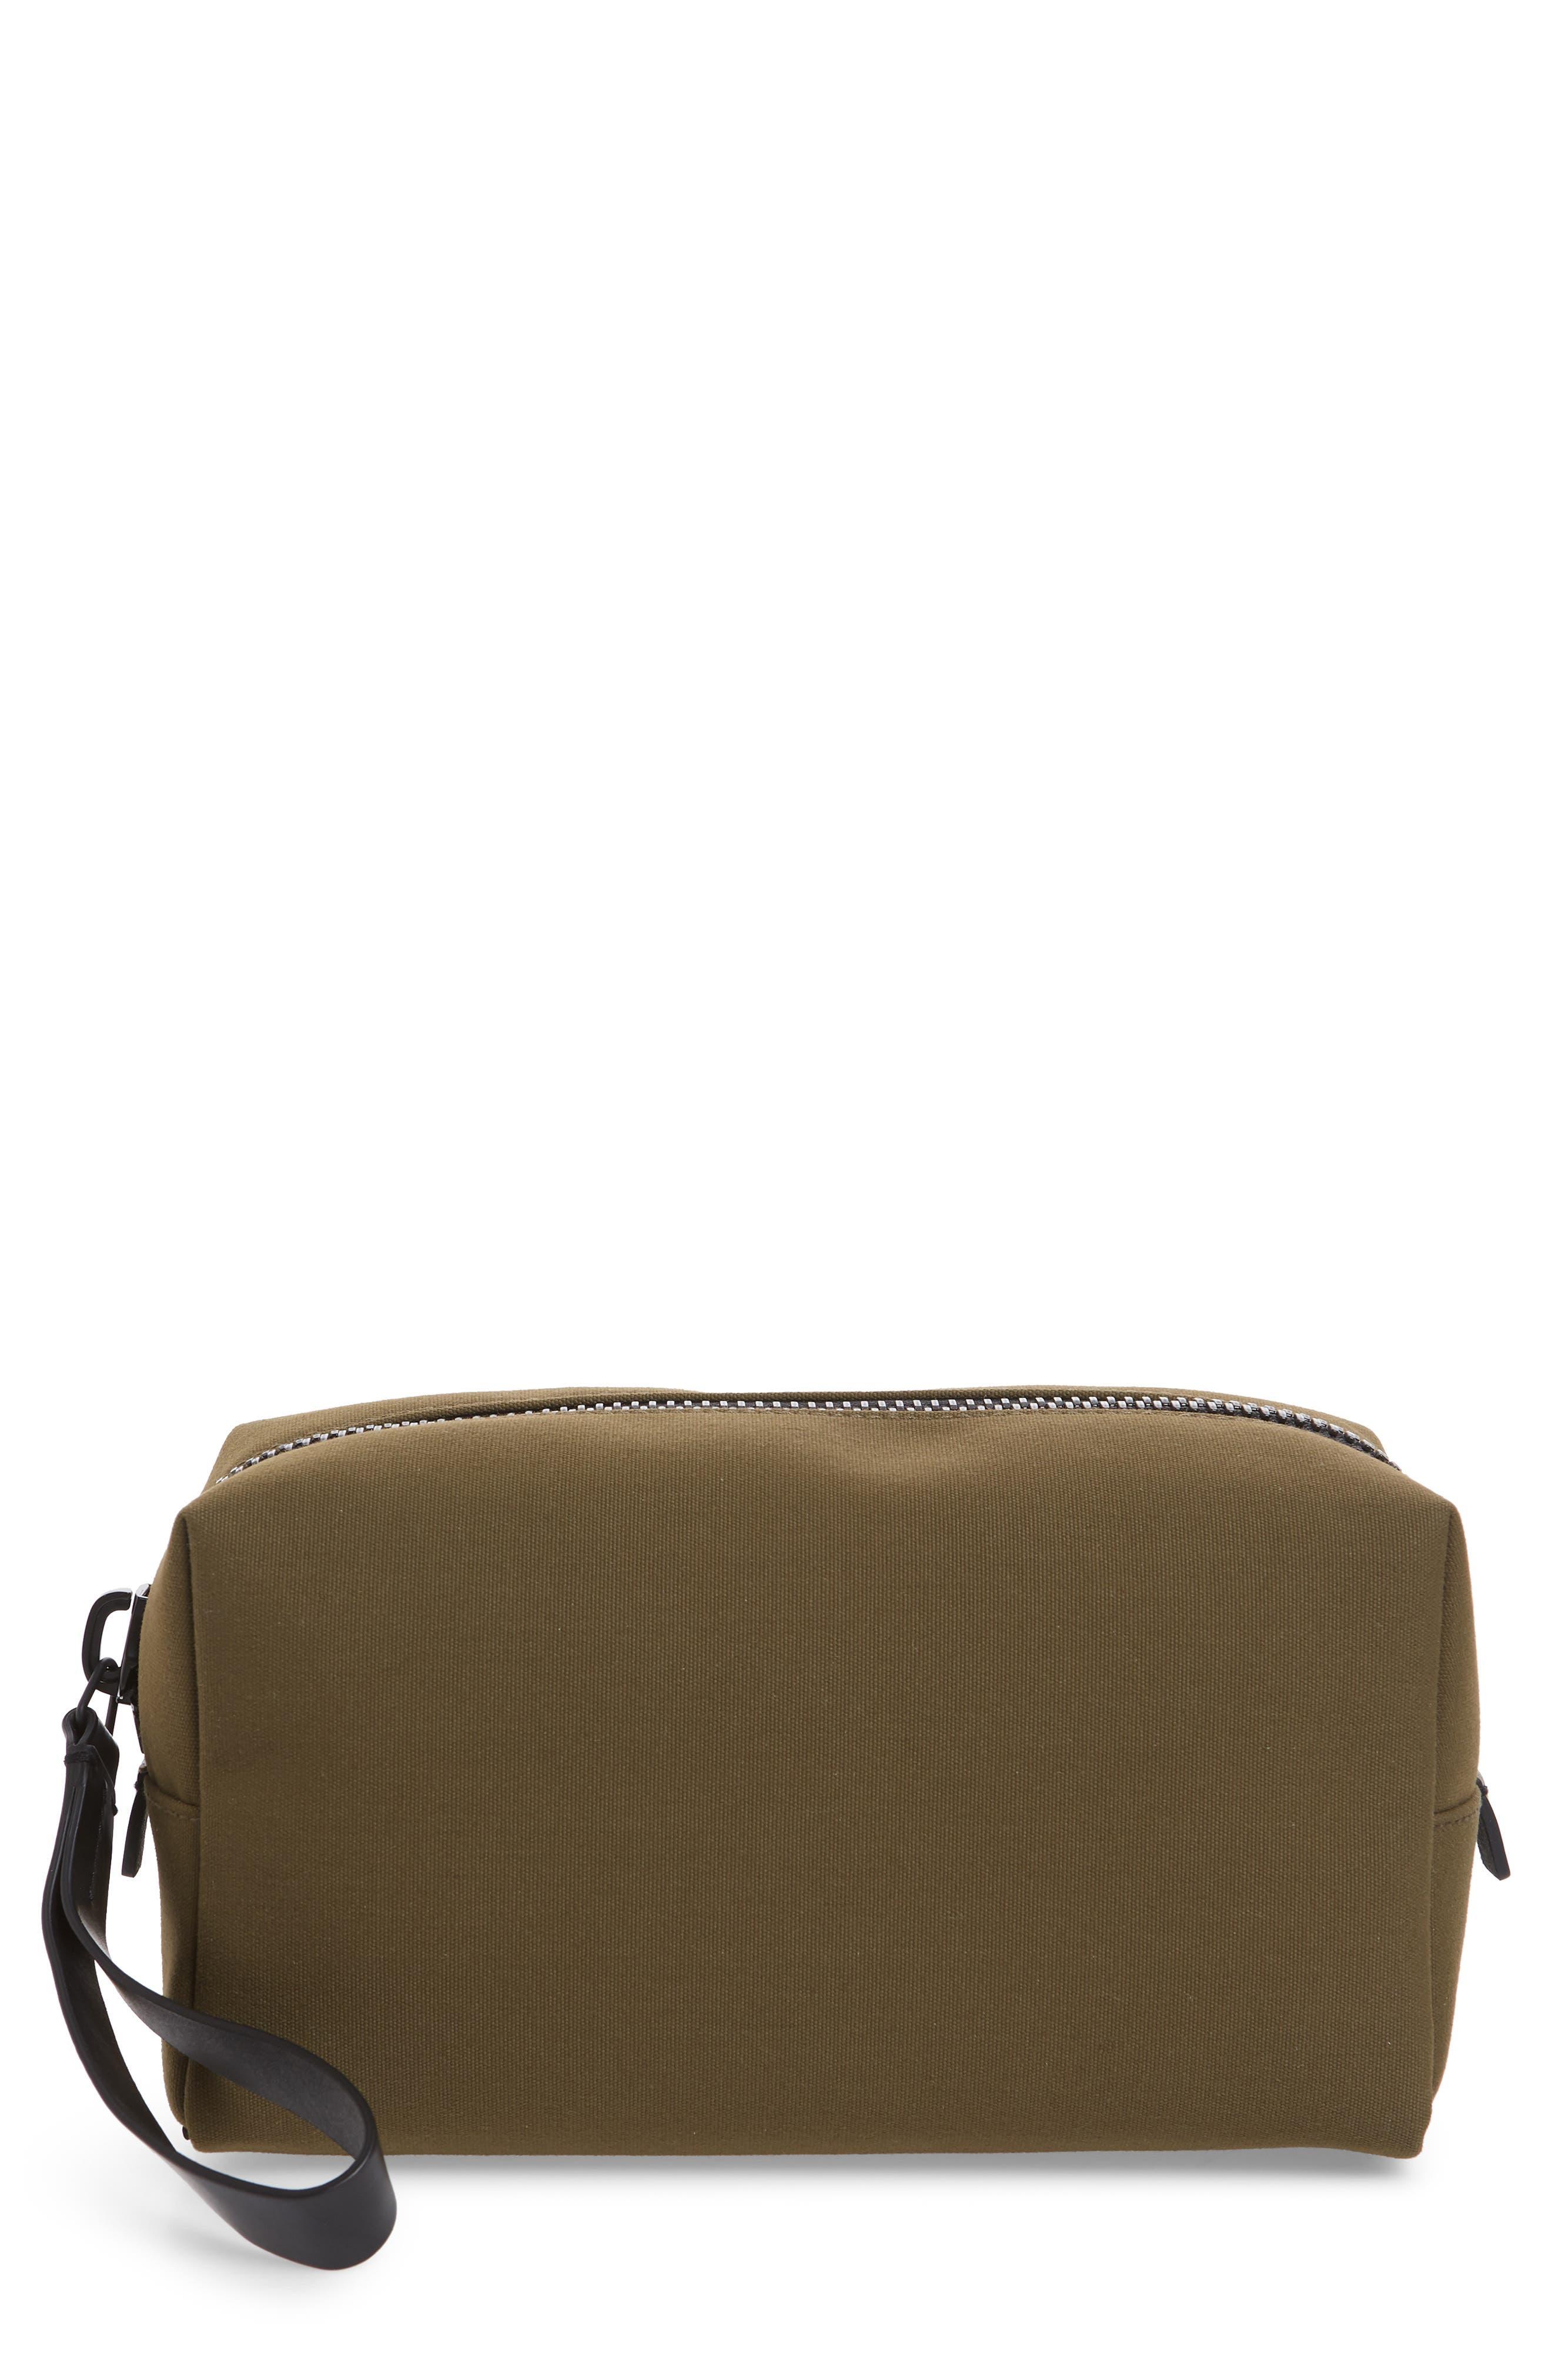 TROUBADOUR Canvas Dopp Kit in Khaki Canvas/ Black Leather